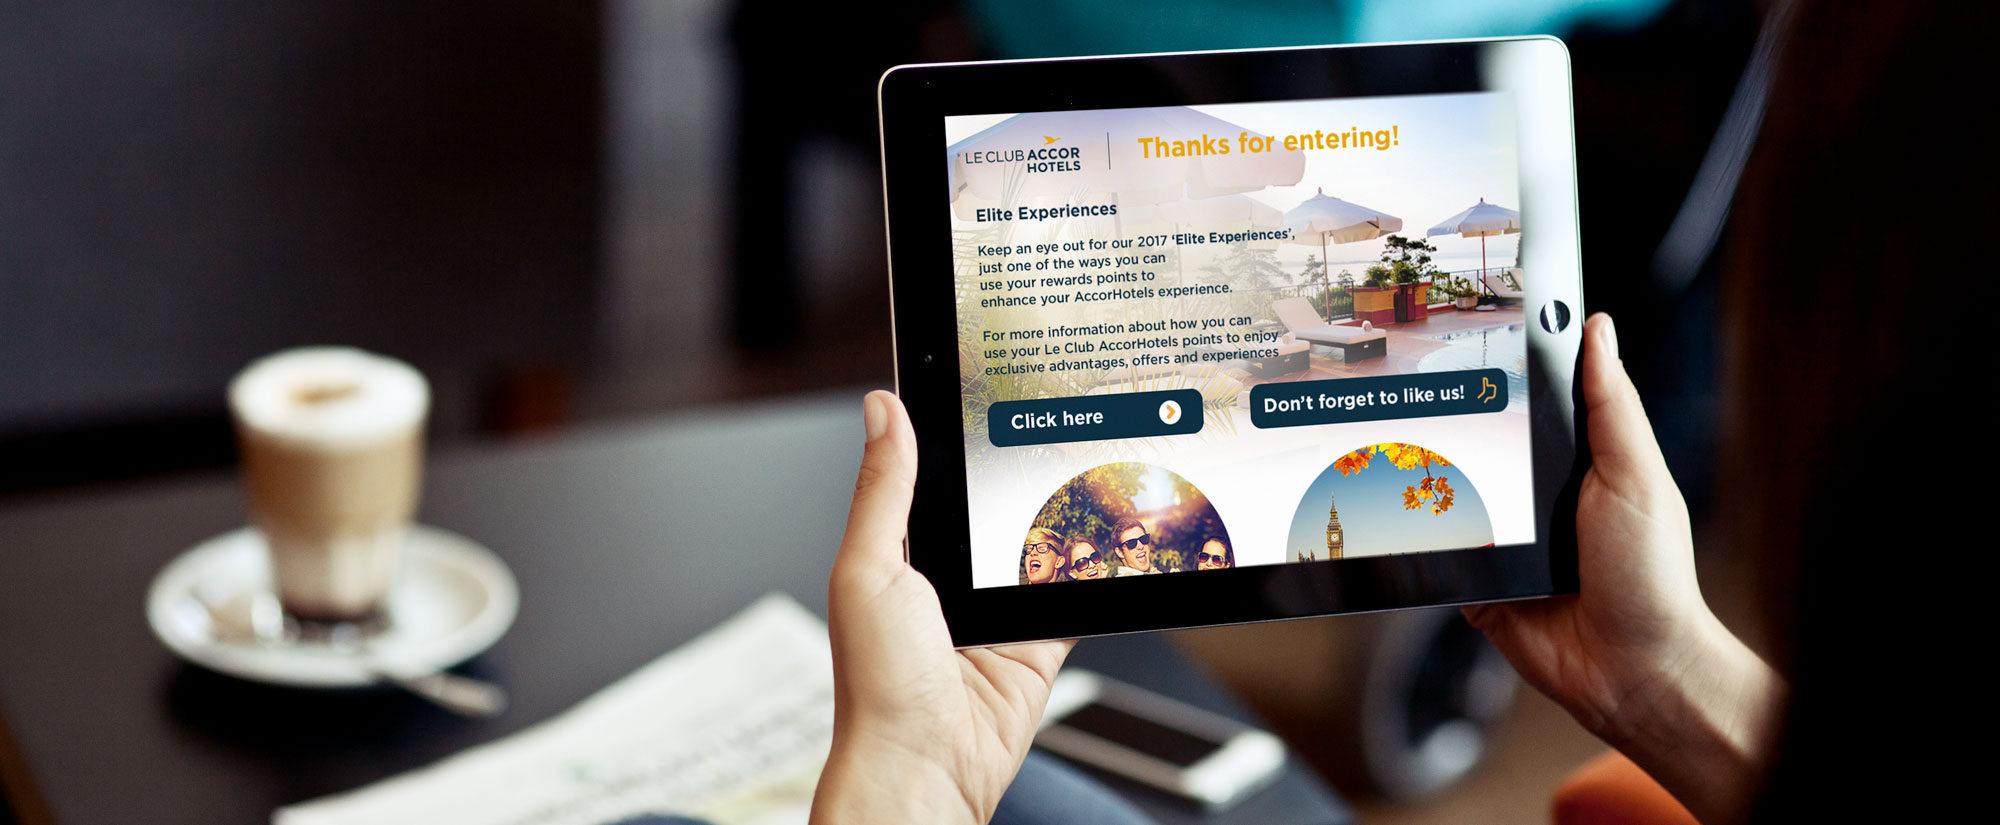 Accorhotels digitalisation accueil